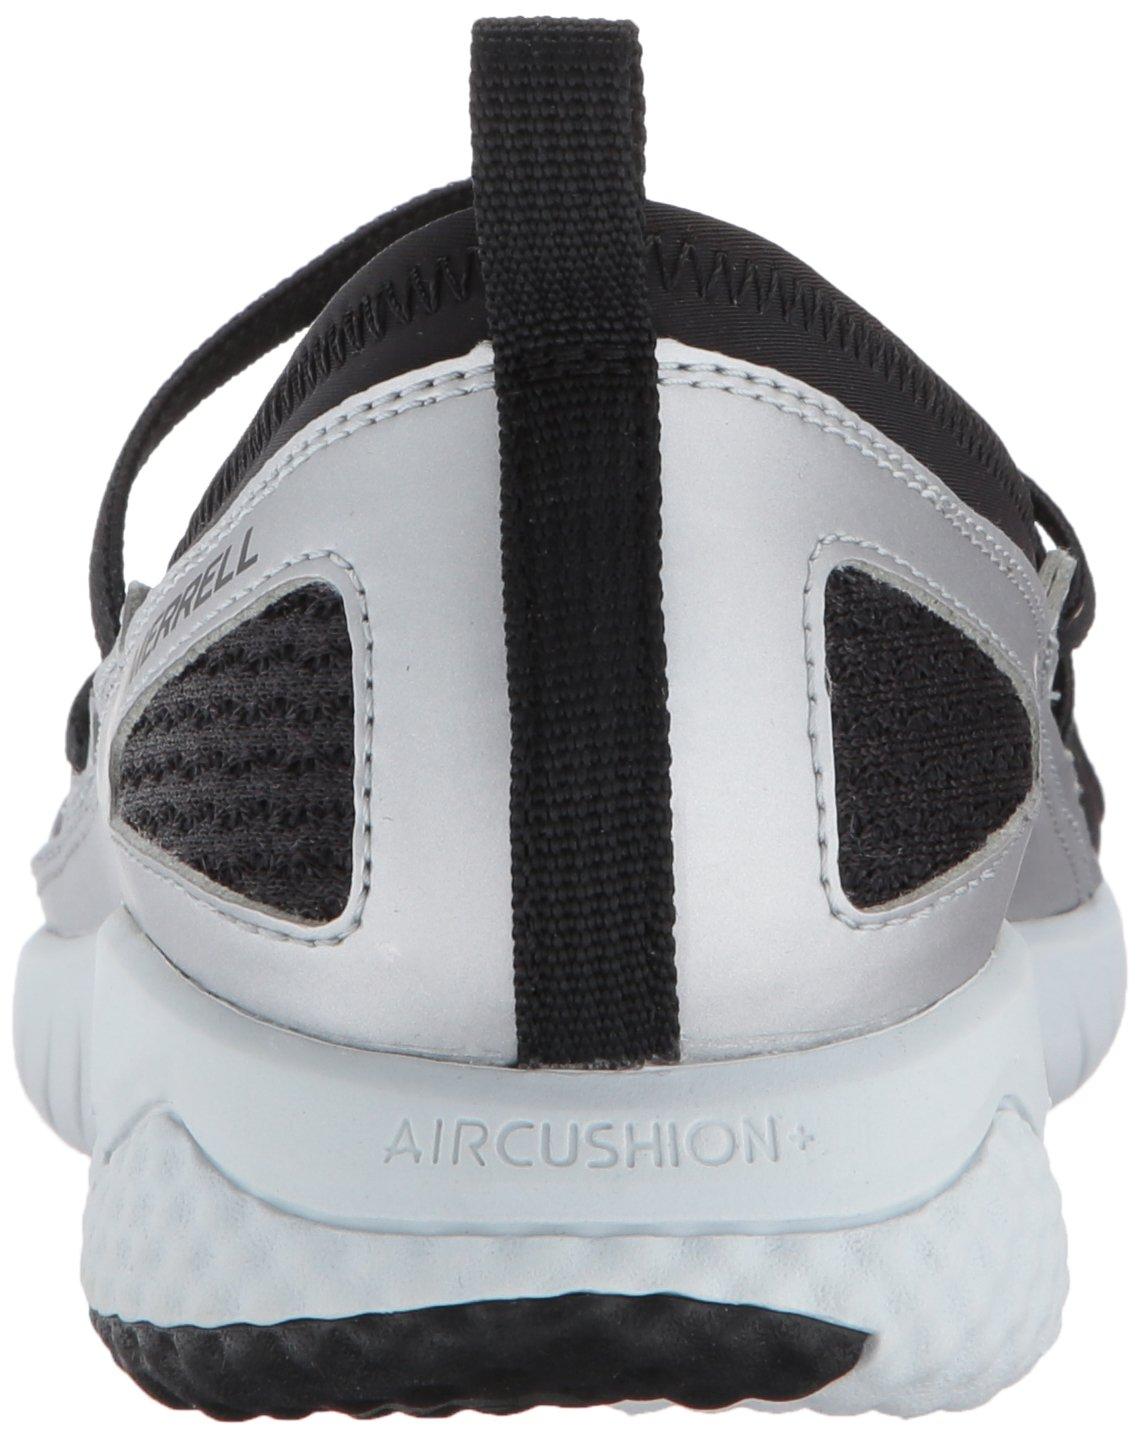 Merrell Women's 1SIX8 MJ AC+ Fashion Sneaker B01N5GB3PC 7 B(M) US Black